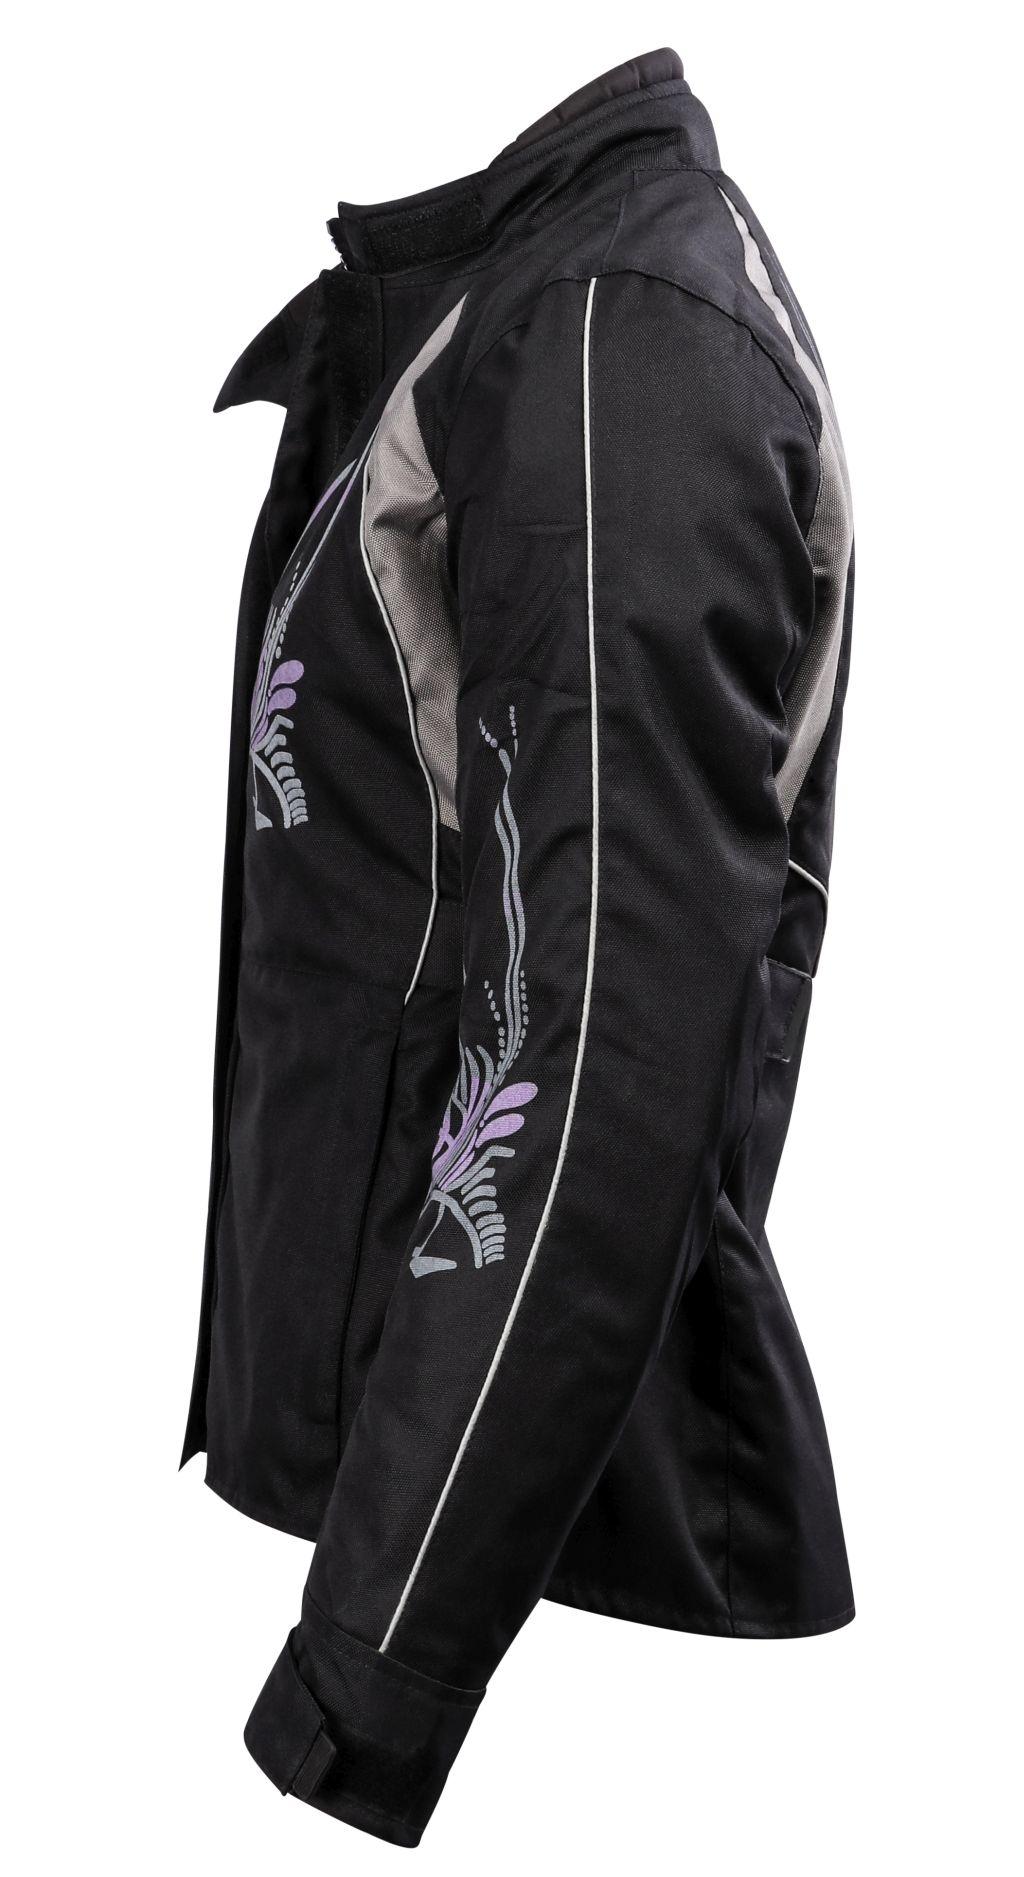 Bangla Damen Motorrad Jacke Motorradjacke Textil Schwarz lila mit Tribal S-XXXL